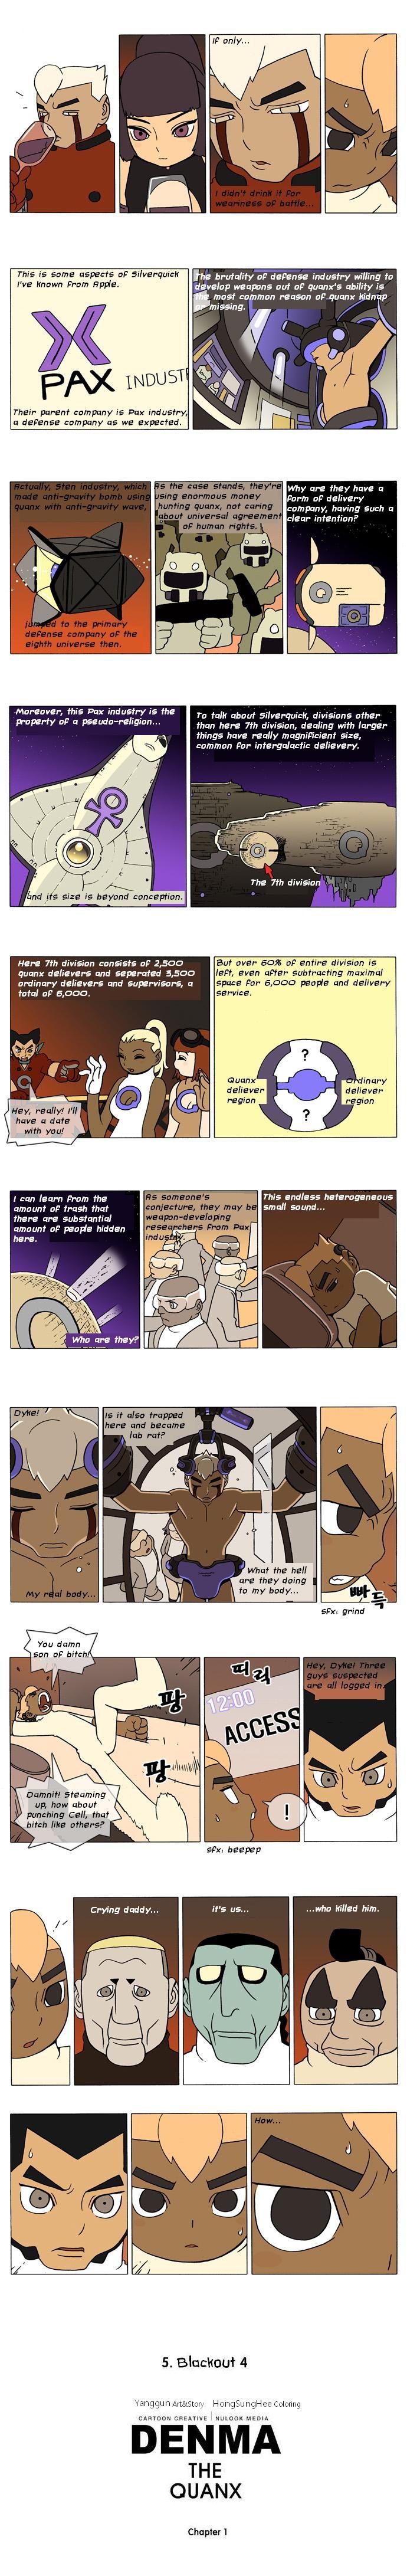 Denma 19 Page 2